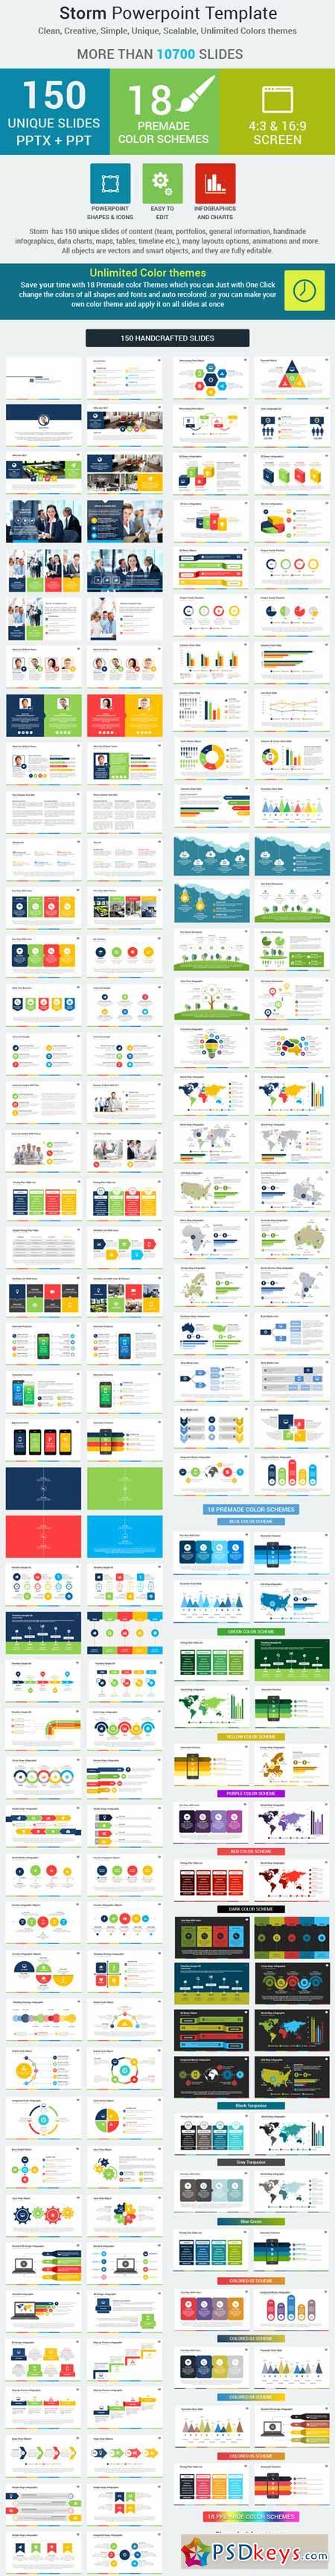 storm powerpoint presentation template 8987774  u00bb free